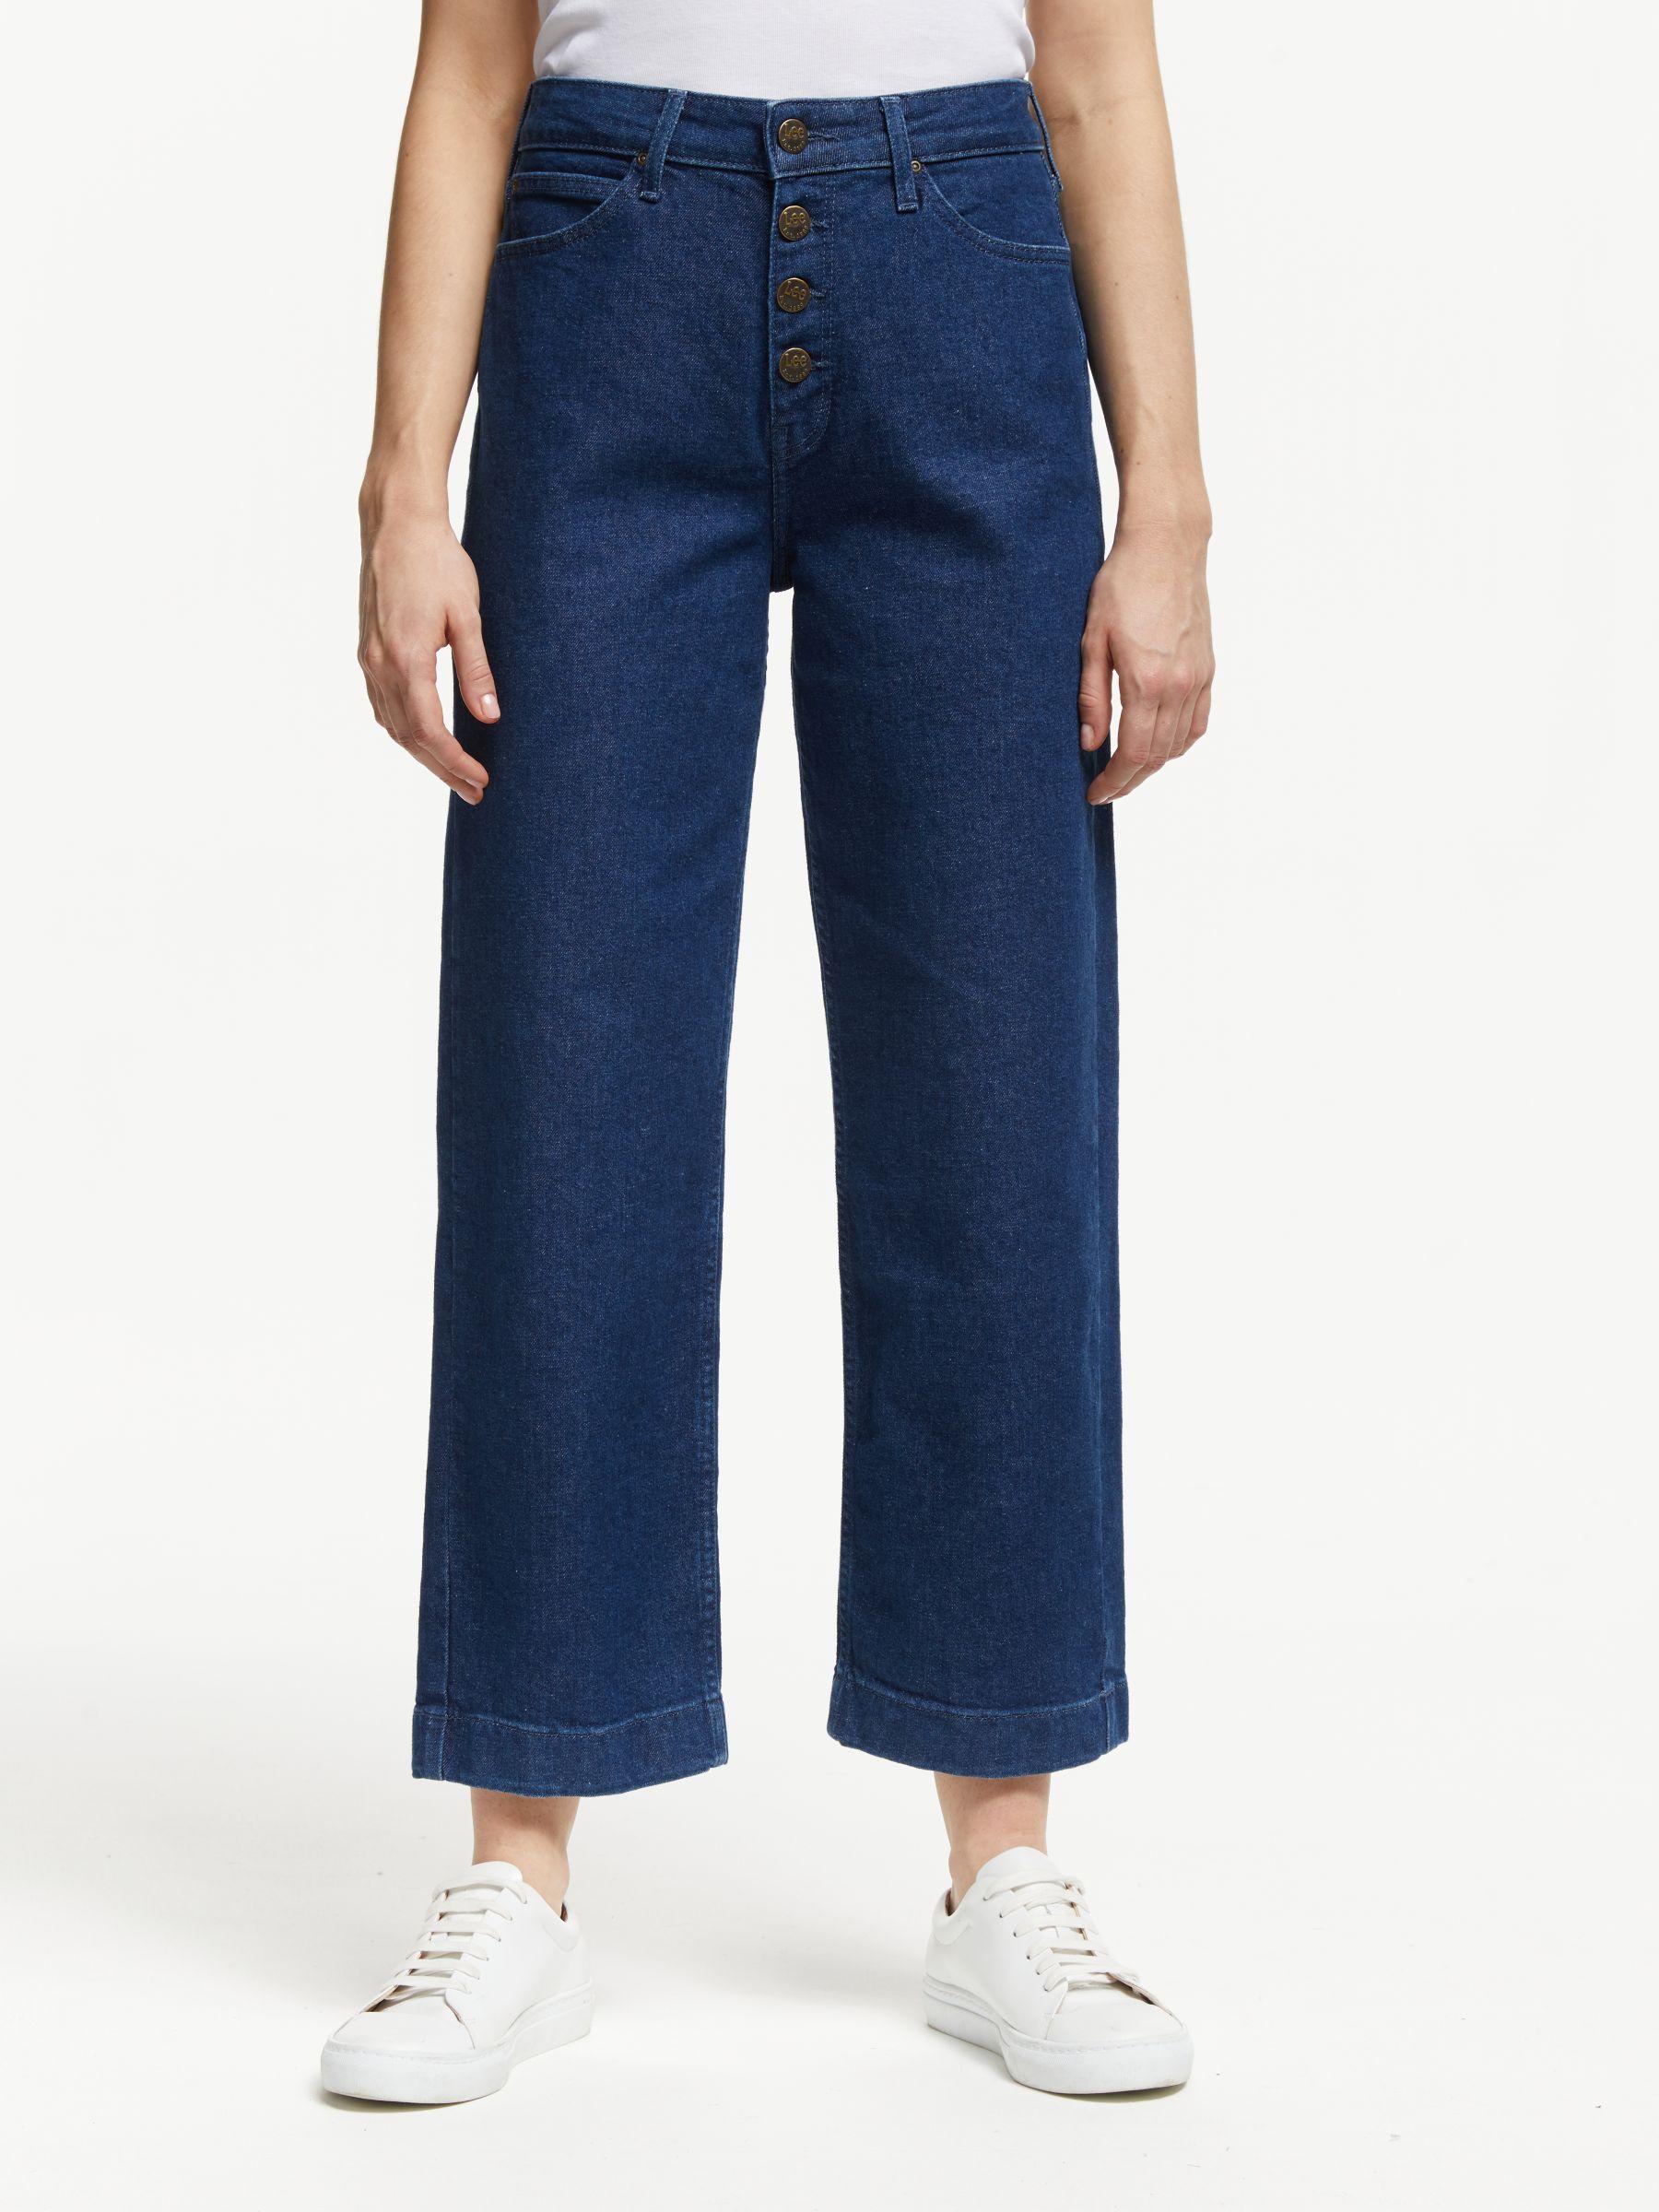 Lee Lee Wide Leg High Waist Cropped Jeans, Dark Wilma